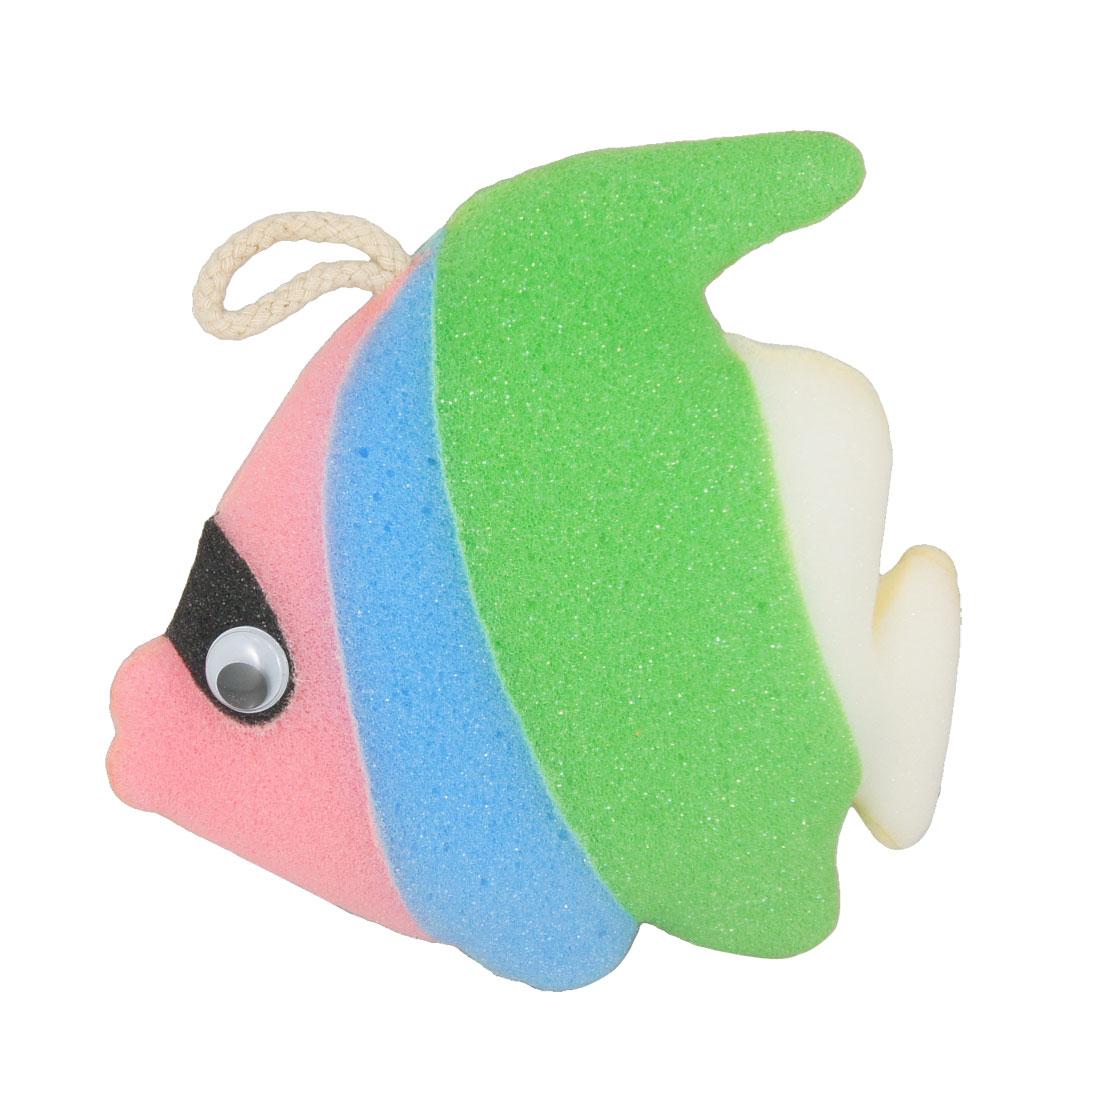 Blue Green Fish Design Bathing Shower Sponge Pouf Body Scrubber Loop